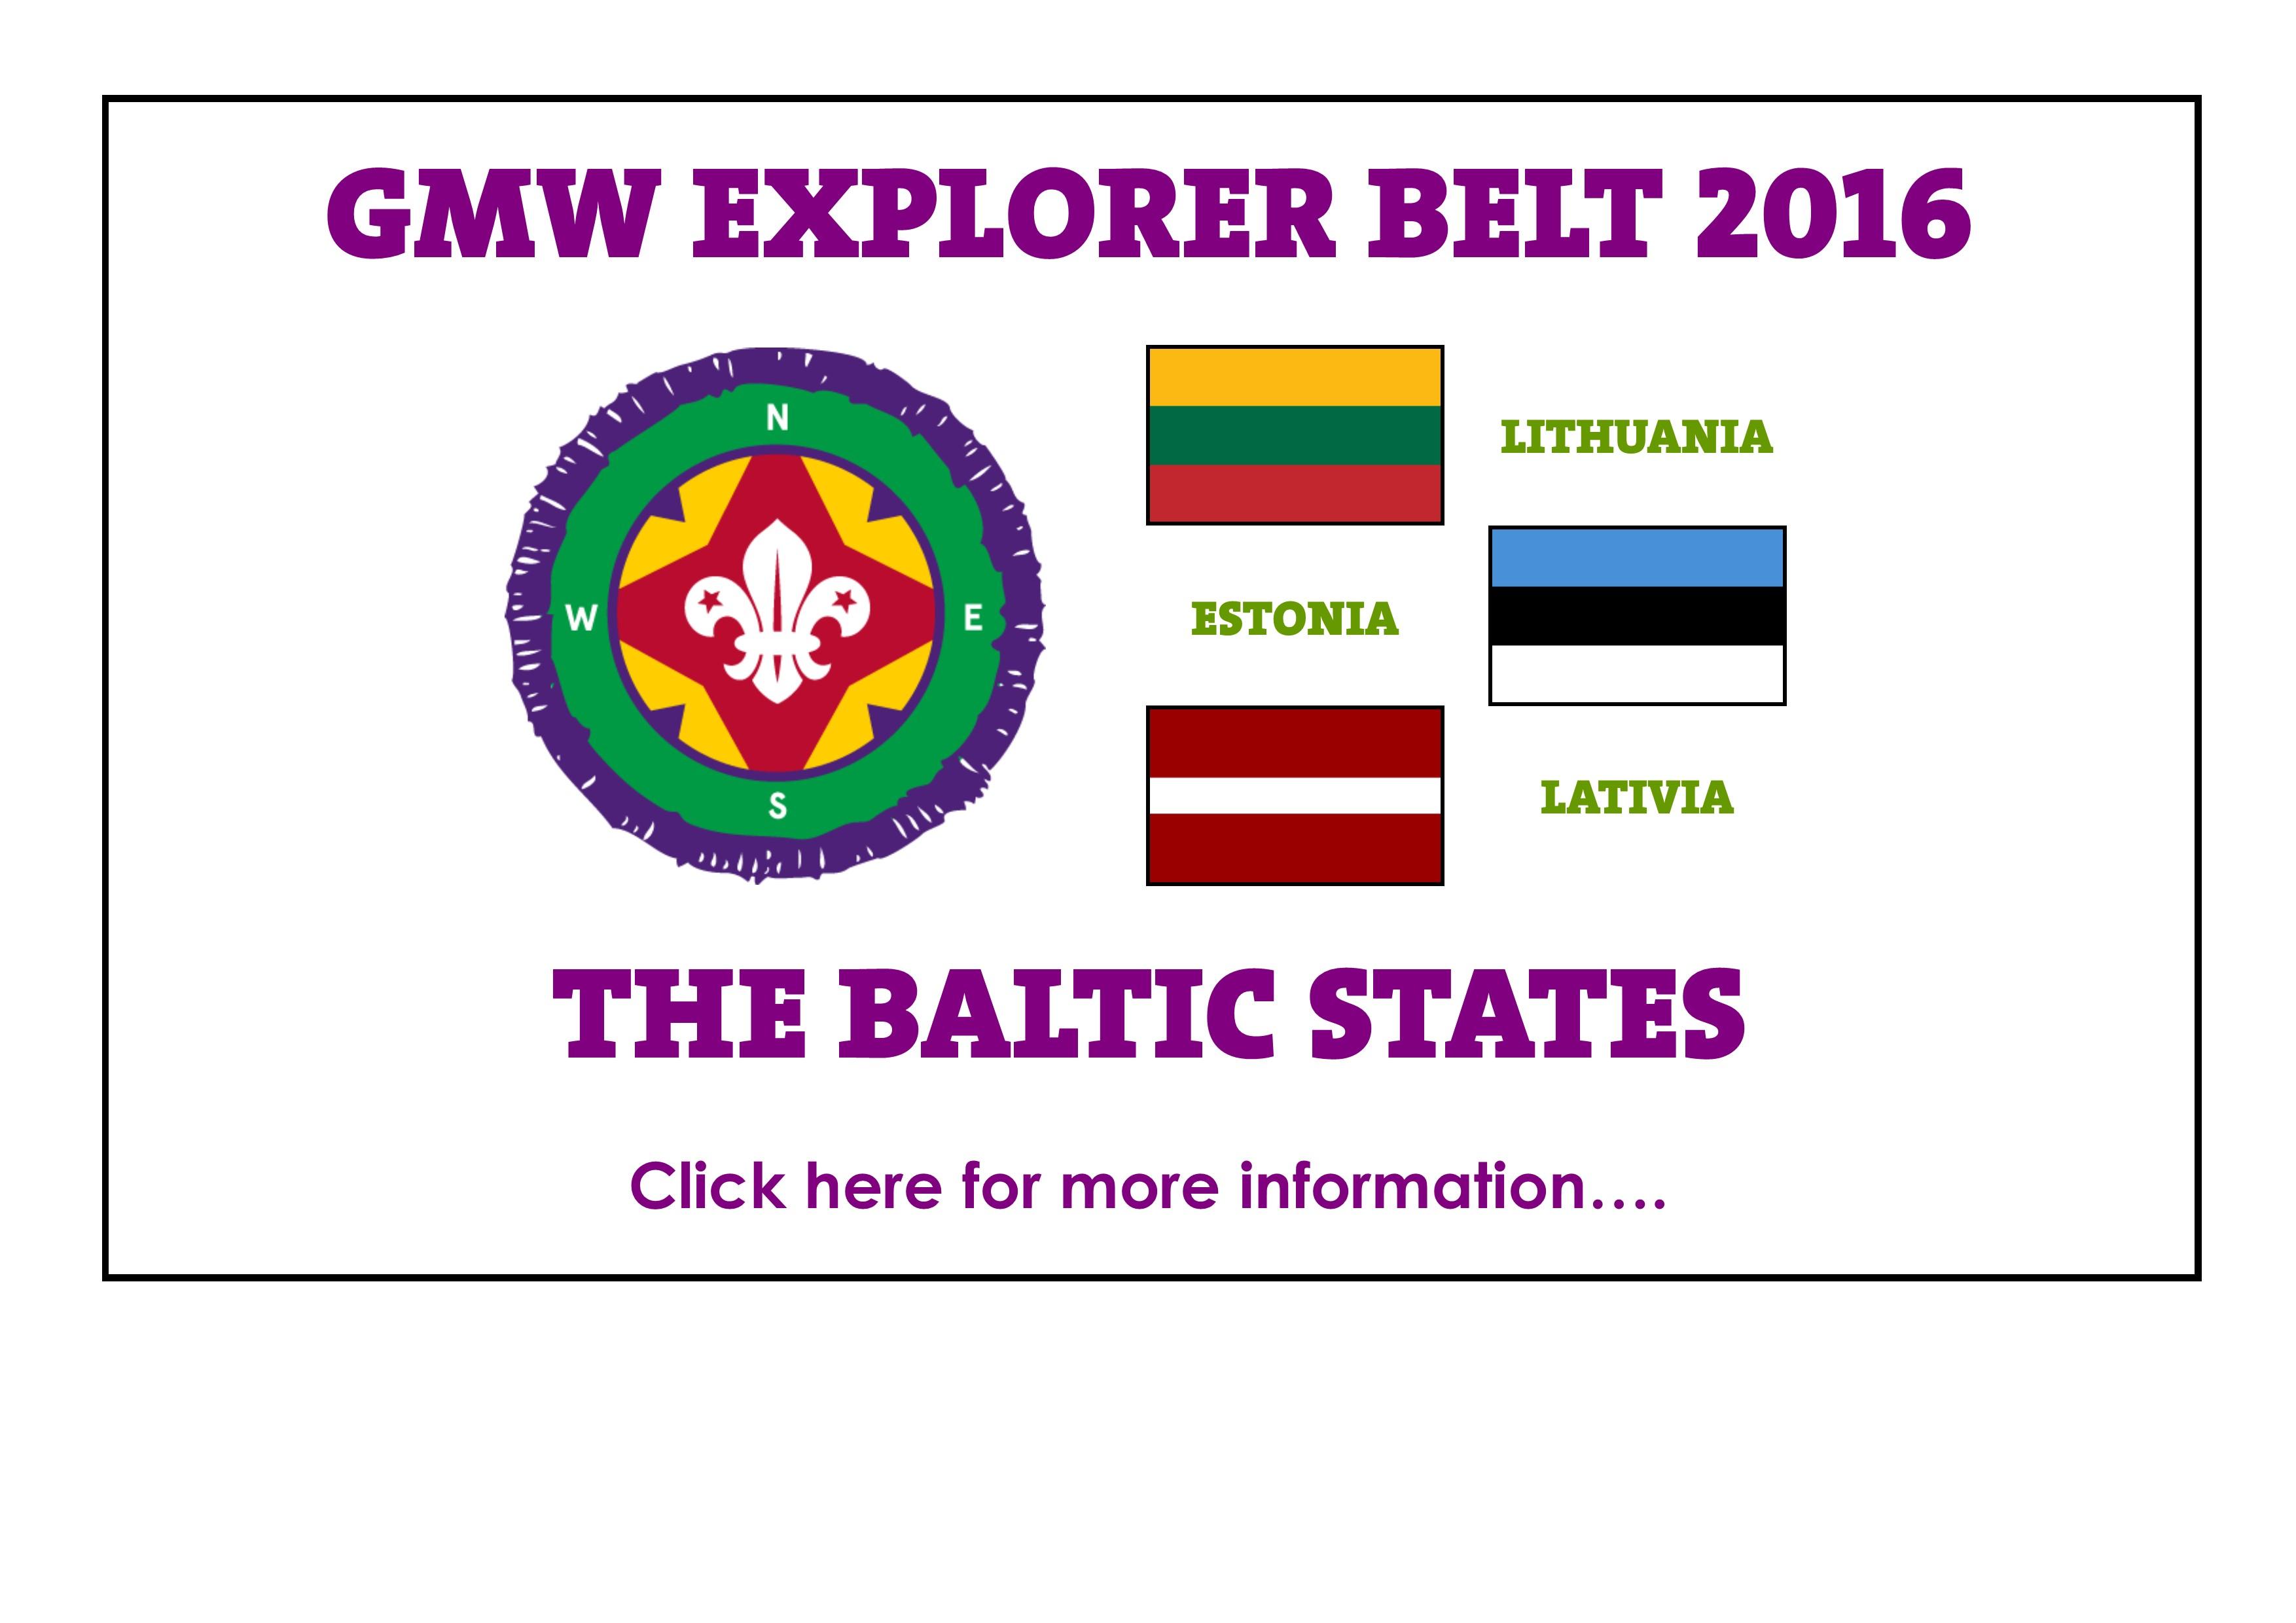 GMW-Explorer-Belt-2016